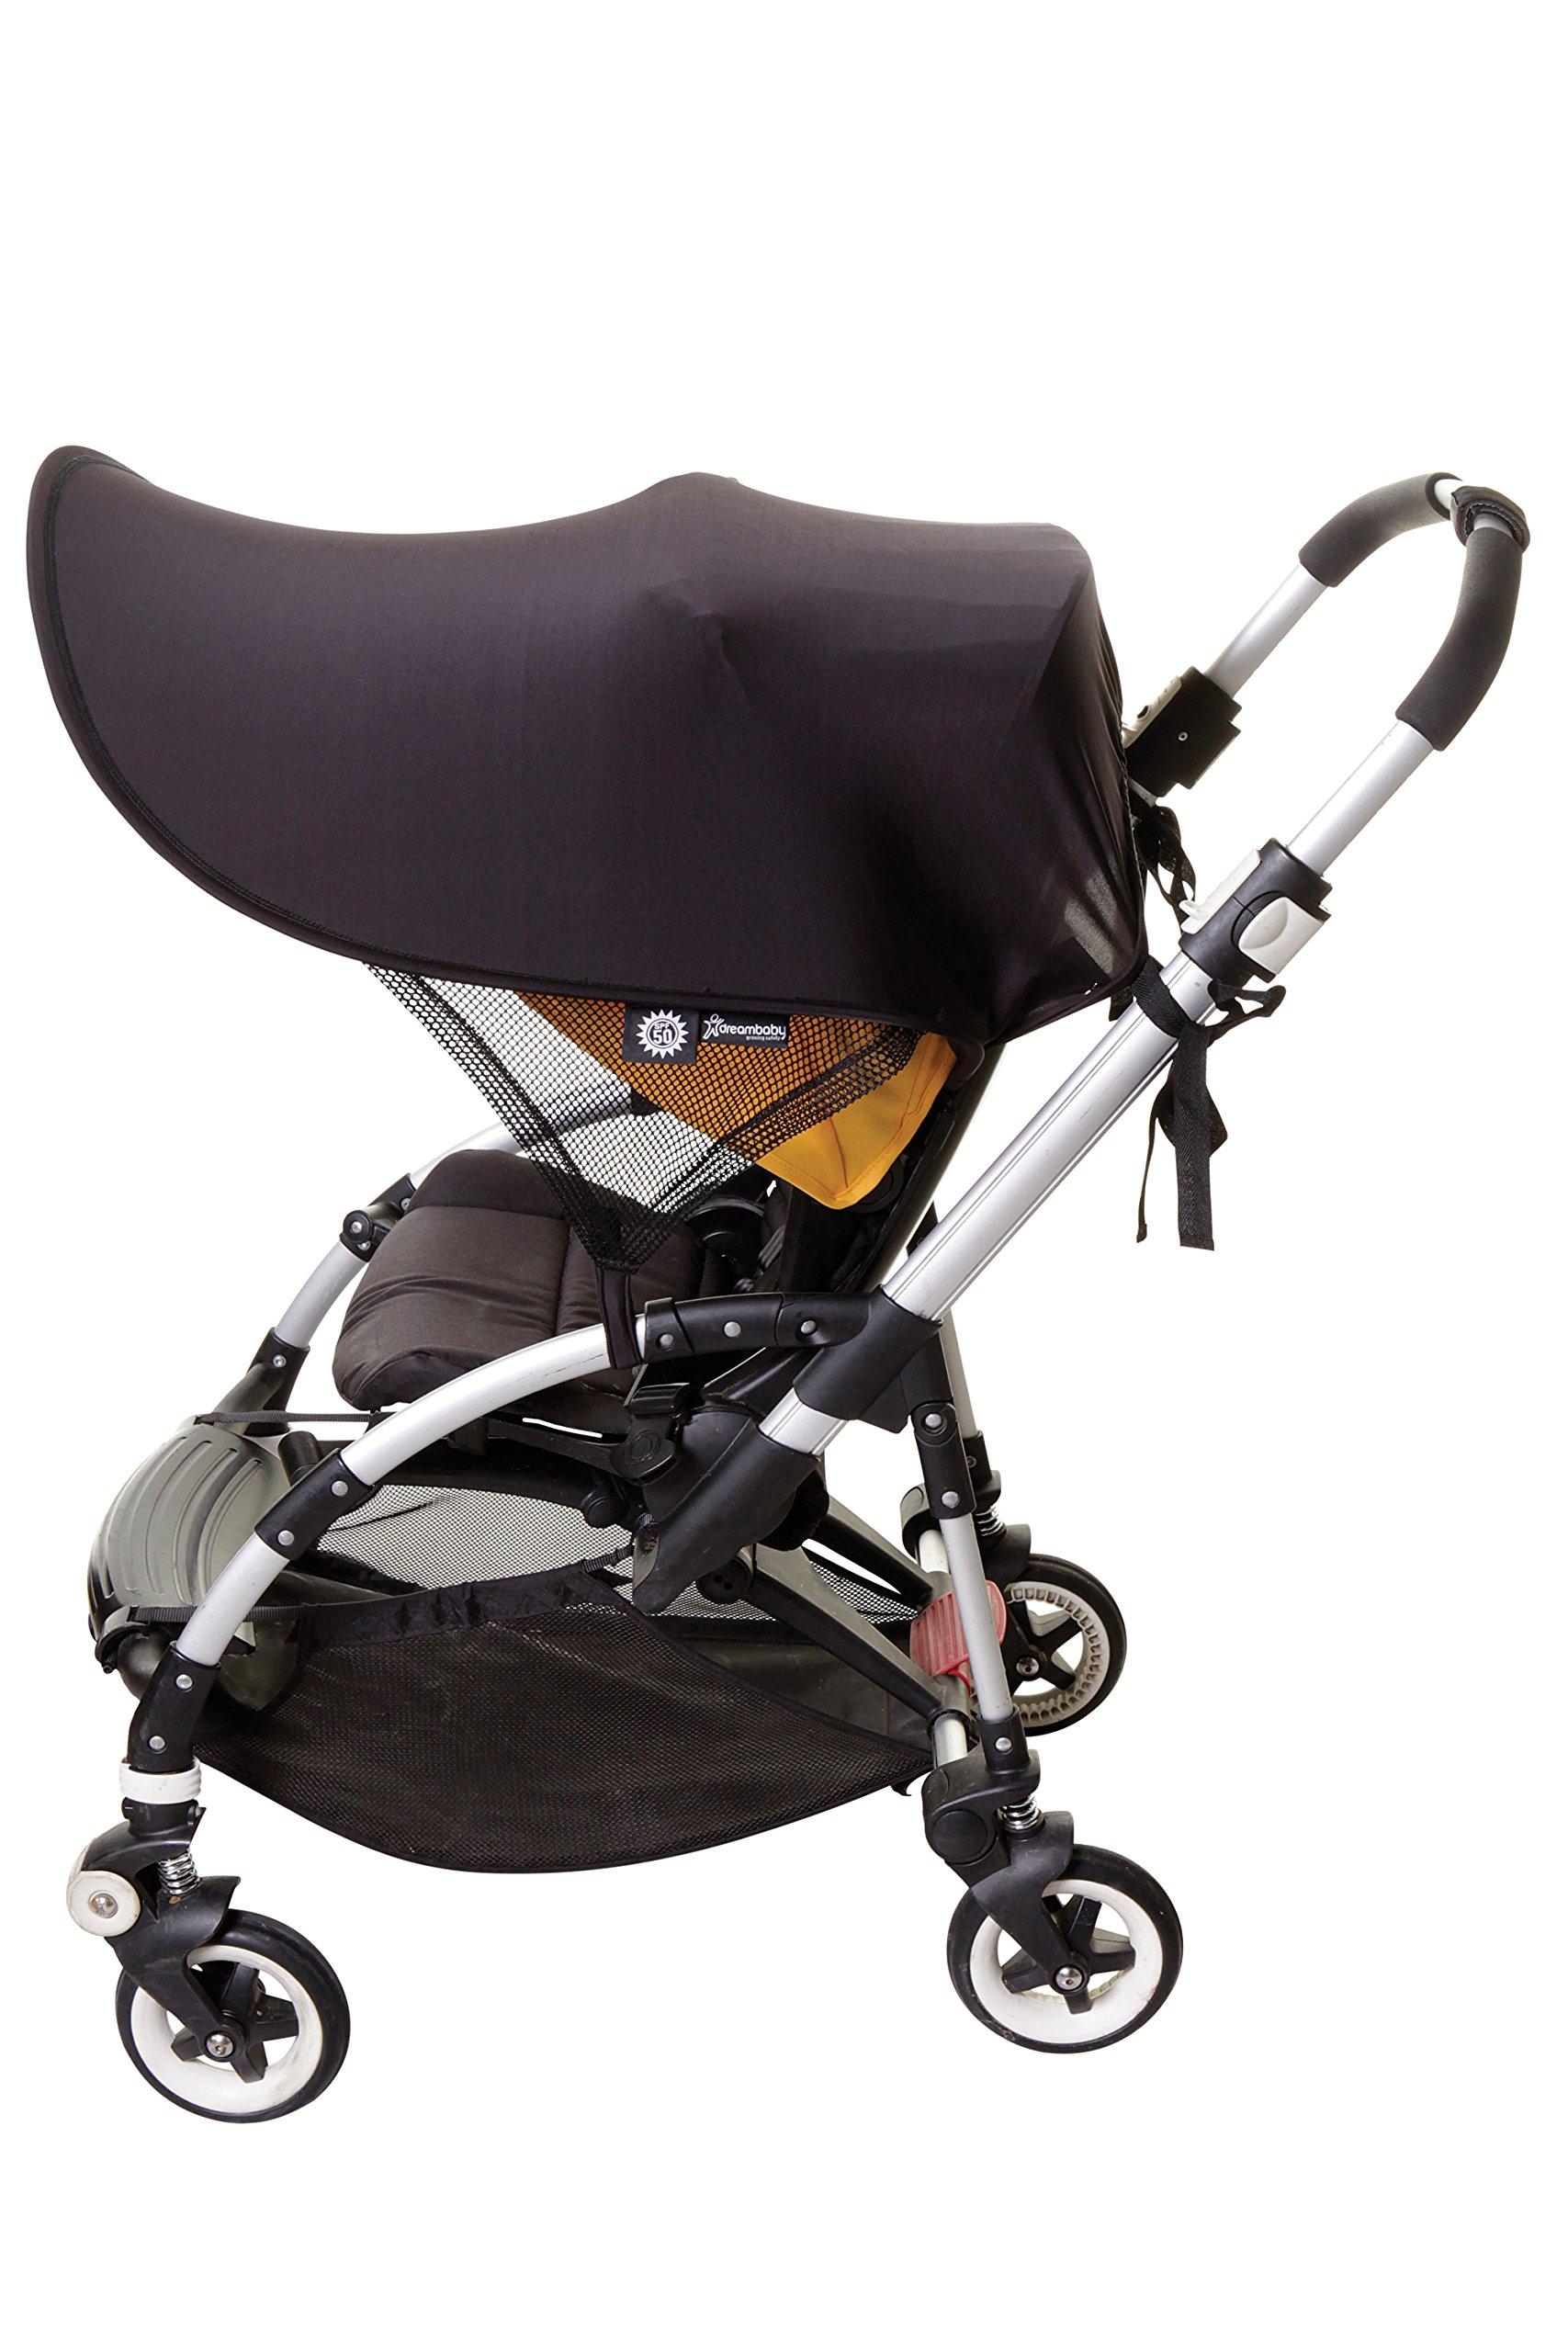 Dreambaby Strollerbuddy Extenda-Shade, Black, Large by Dreambaby